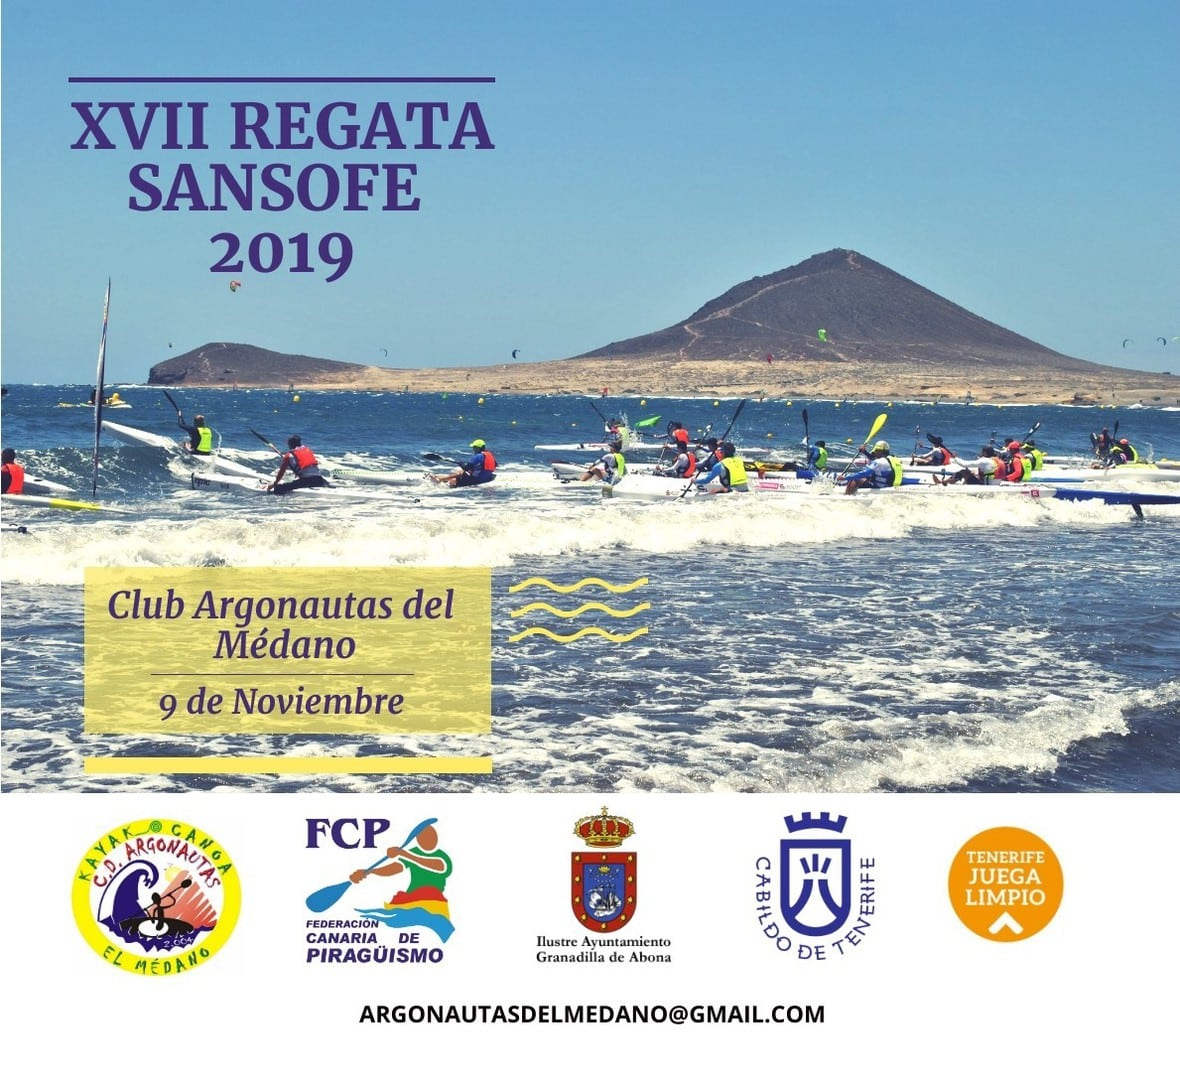 La 'Regata de Piragüismo Sansofé 2019' este sábado en El Médano